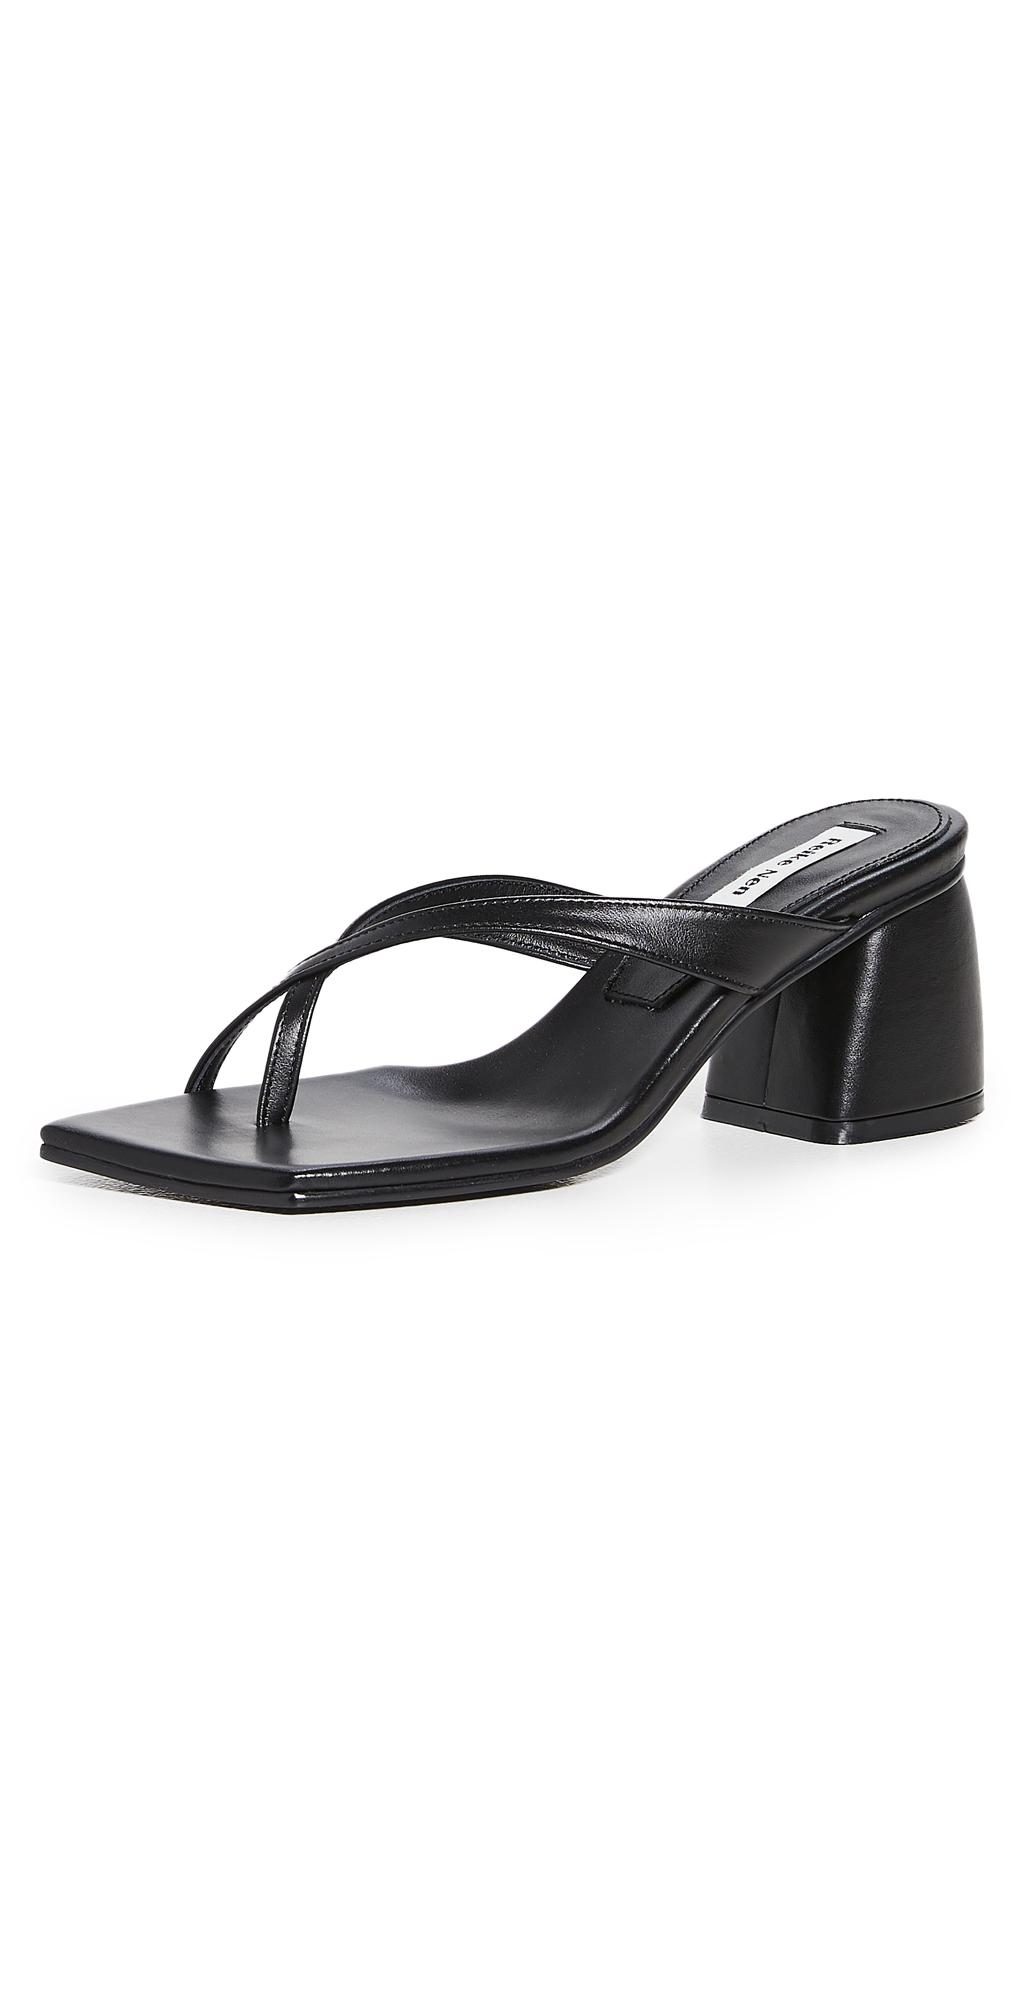 Reike Nen X Strap Flip Flop Heels